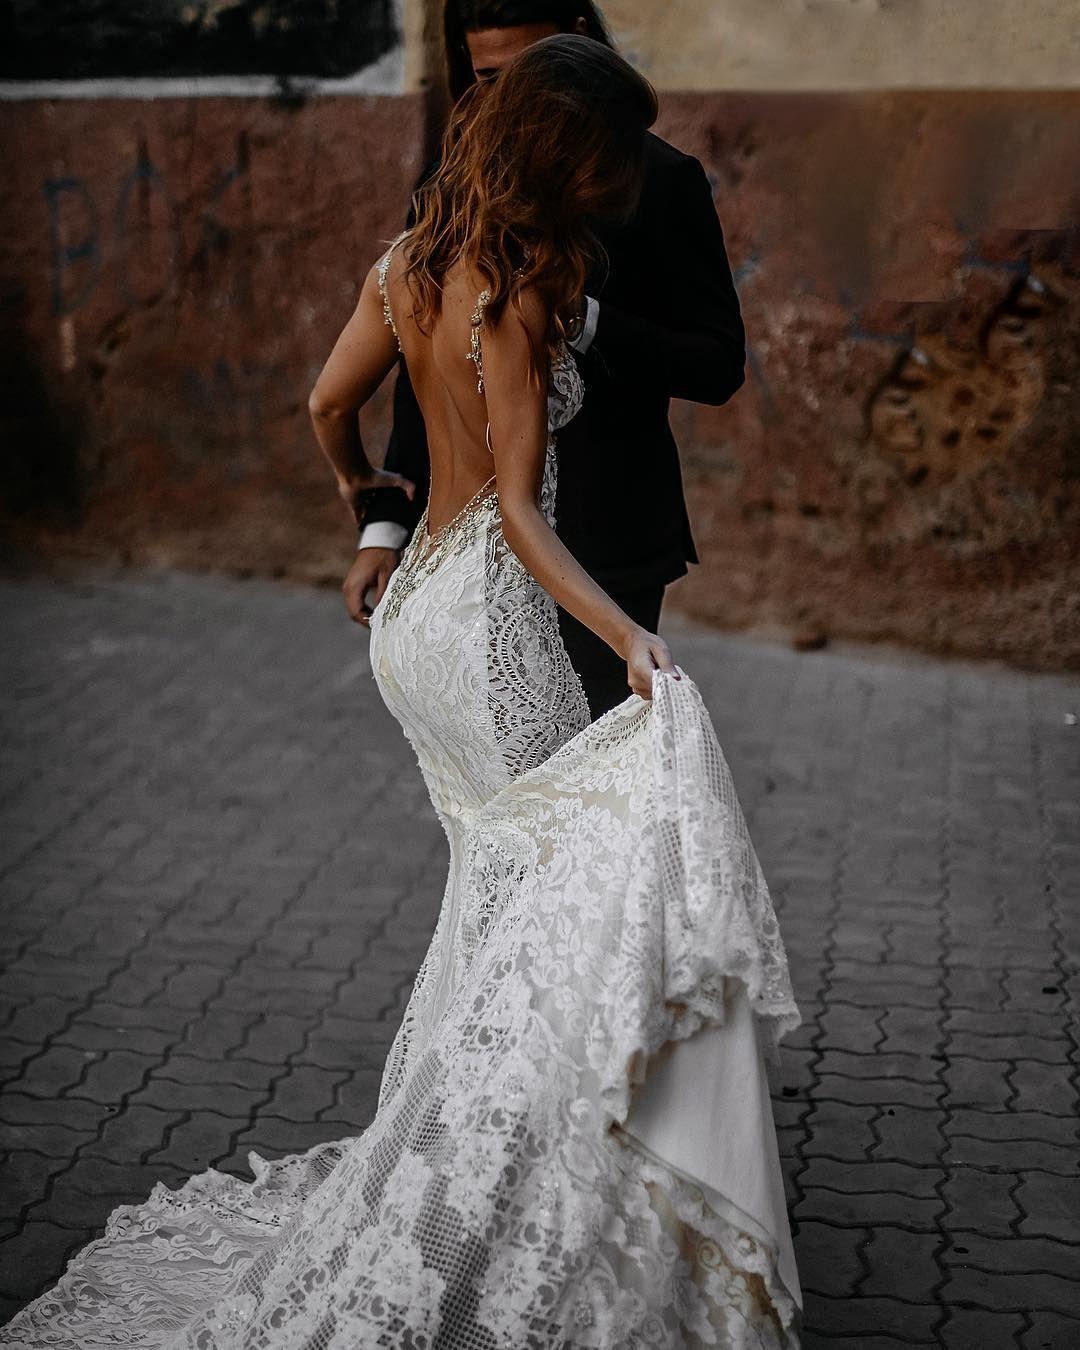 New Vintage Lace Backless Elegant Simple Modest A Line Wedding Dresses Wd0261 Long Wedding Dresses Ivory Wedding Dress Beach Wedding Dress [ 1024 x 1024 Pixel ]